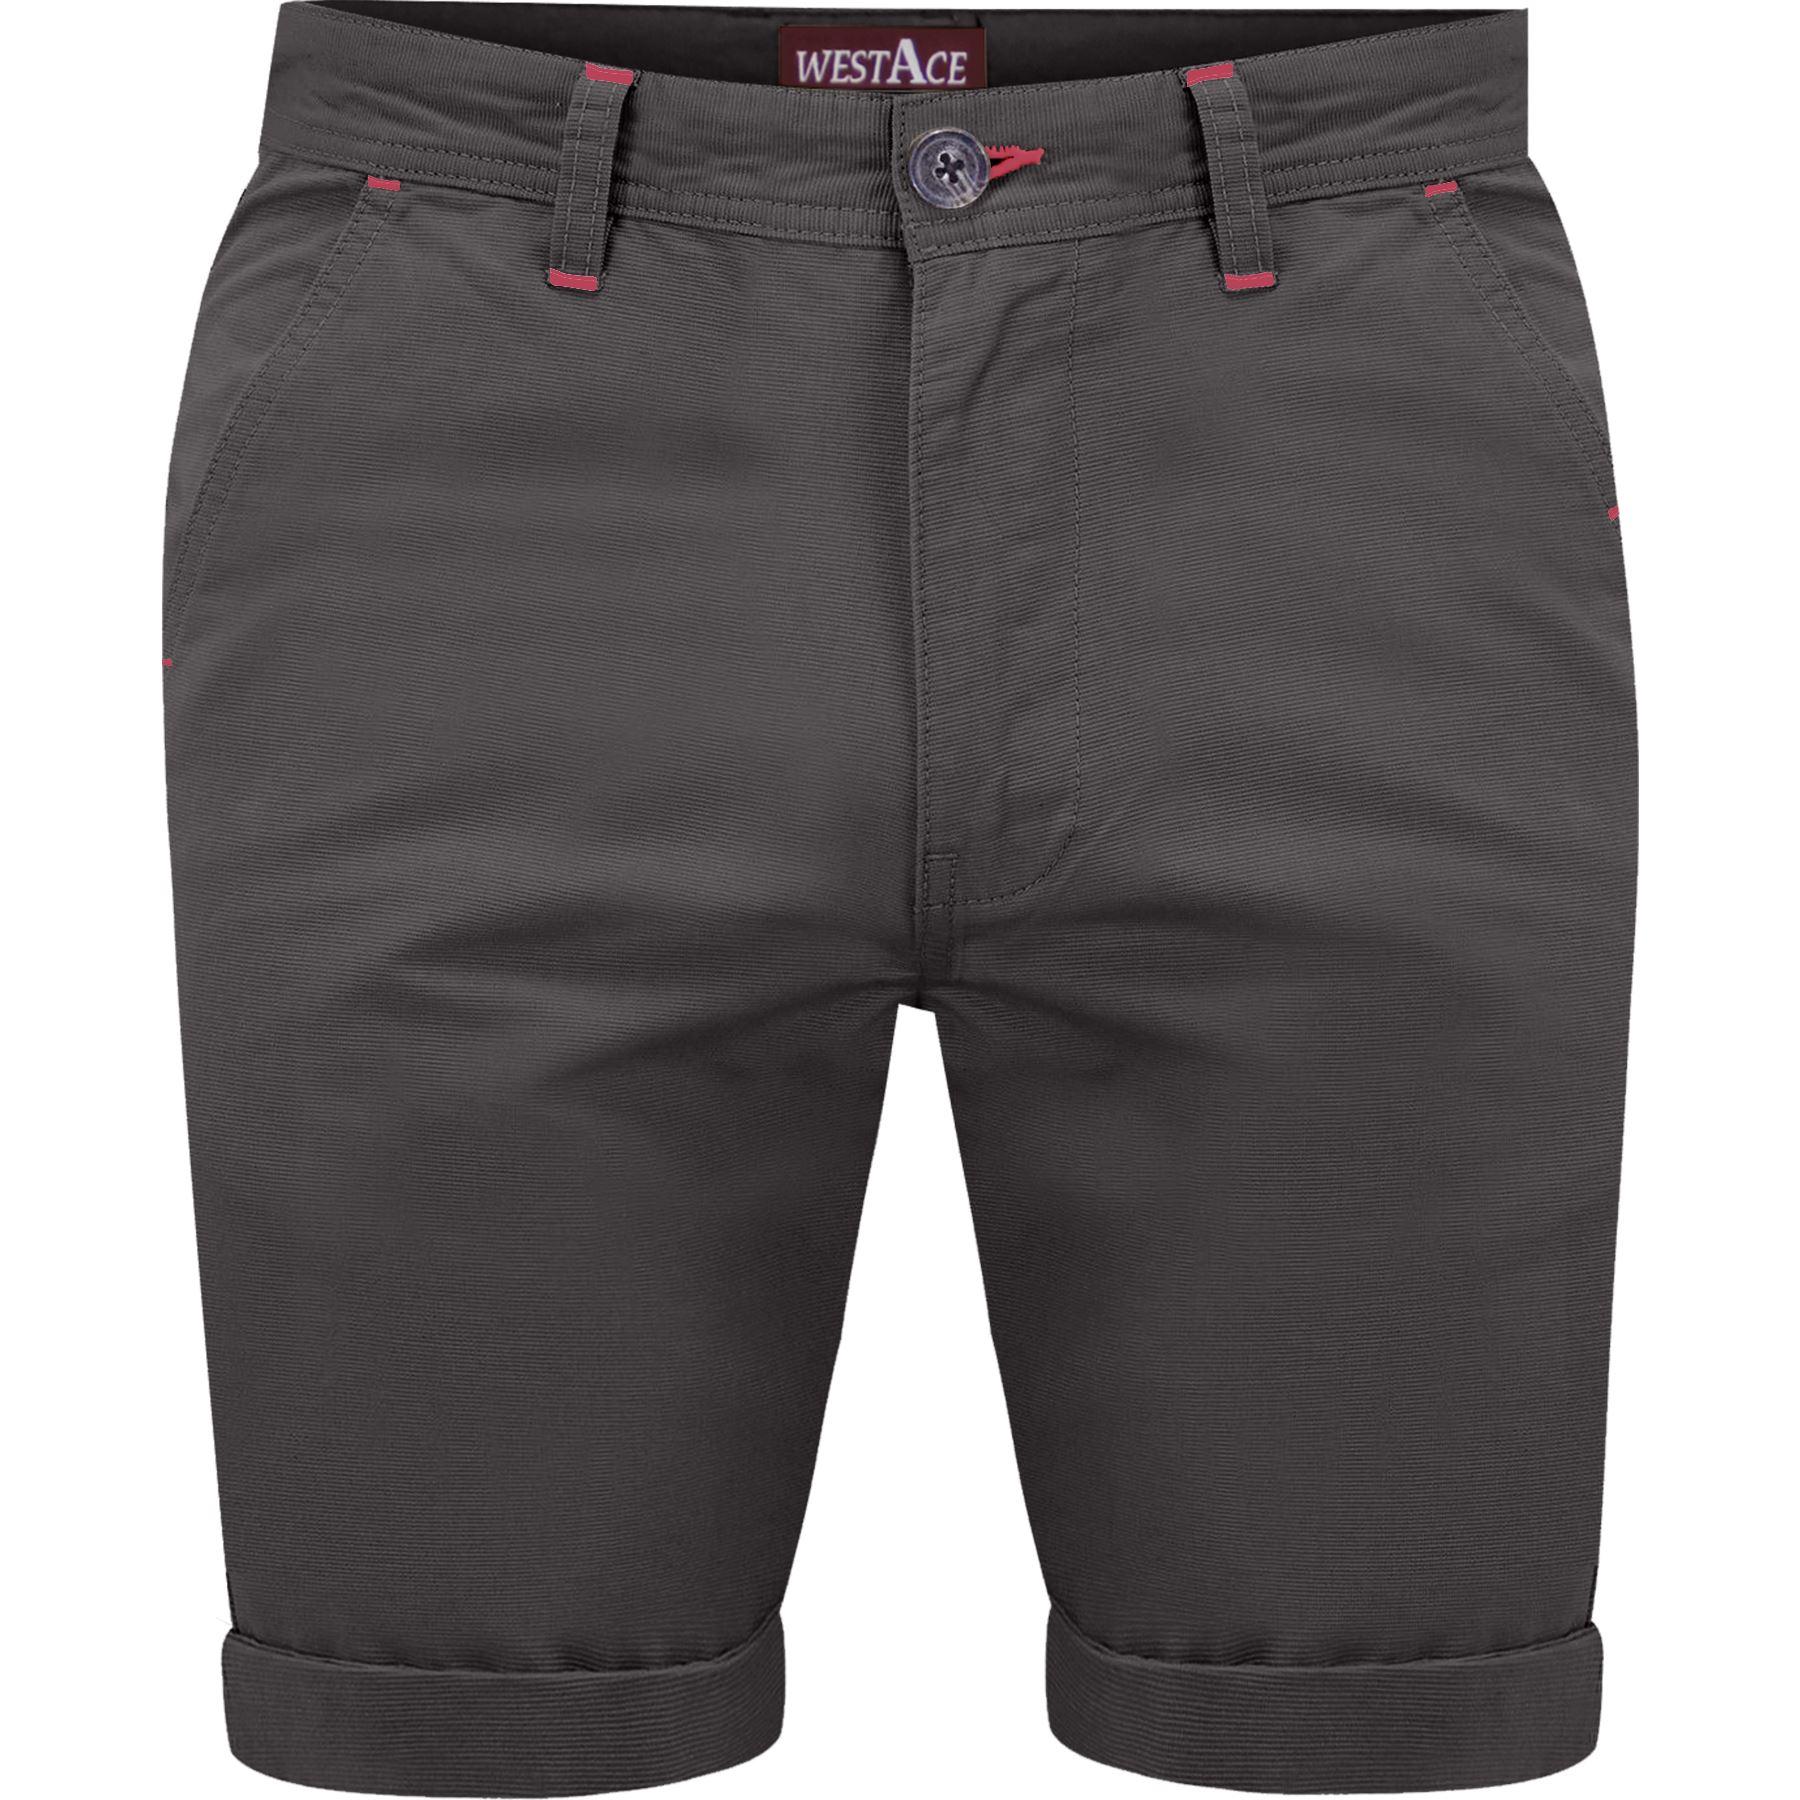 Mens-Chino-Shorts-Cotton-Summer-Casual-Jeans-Cargo-Combat-Half-Pants-Casual-New thumbnail 10